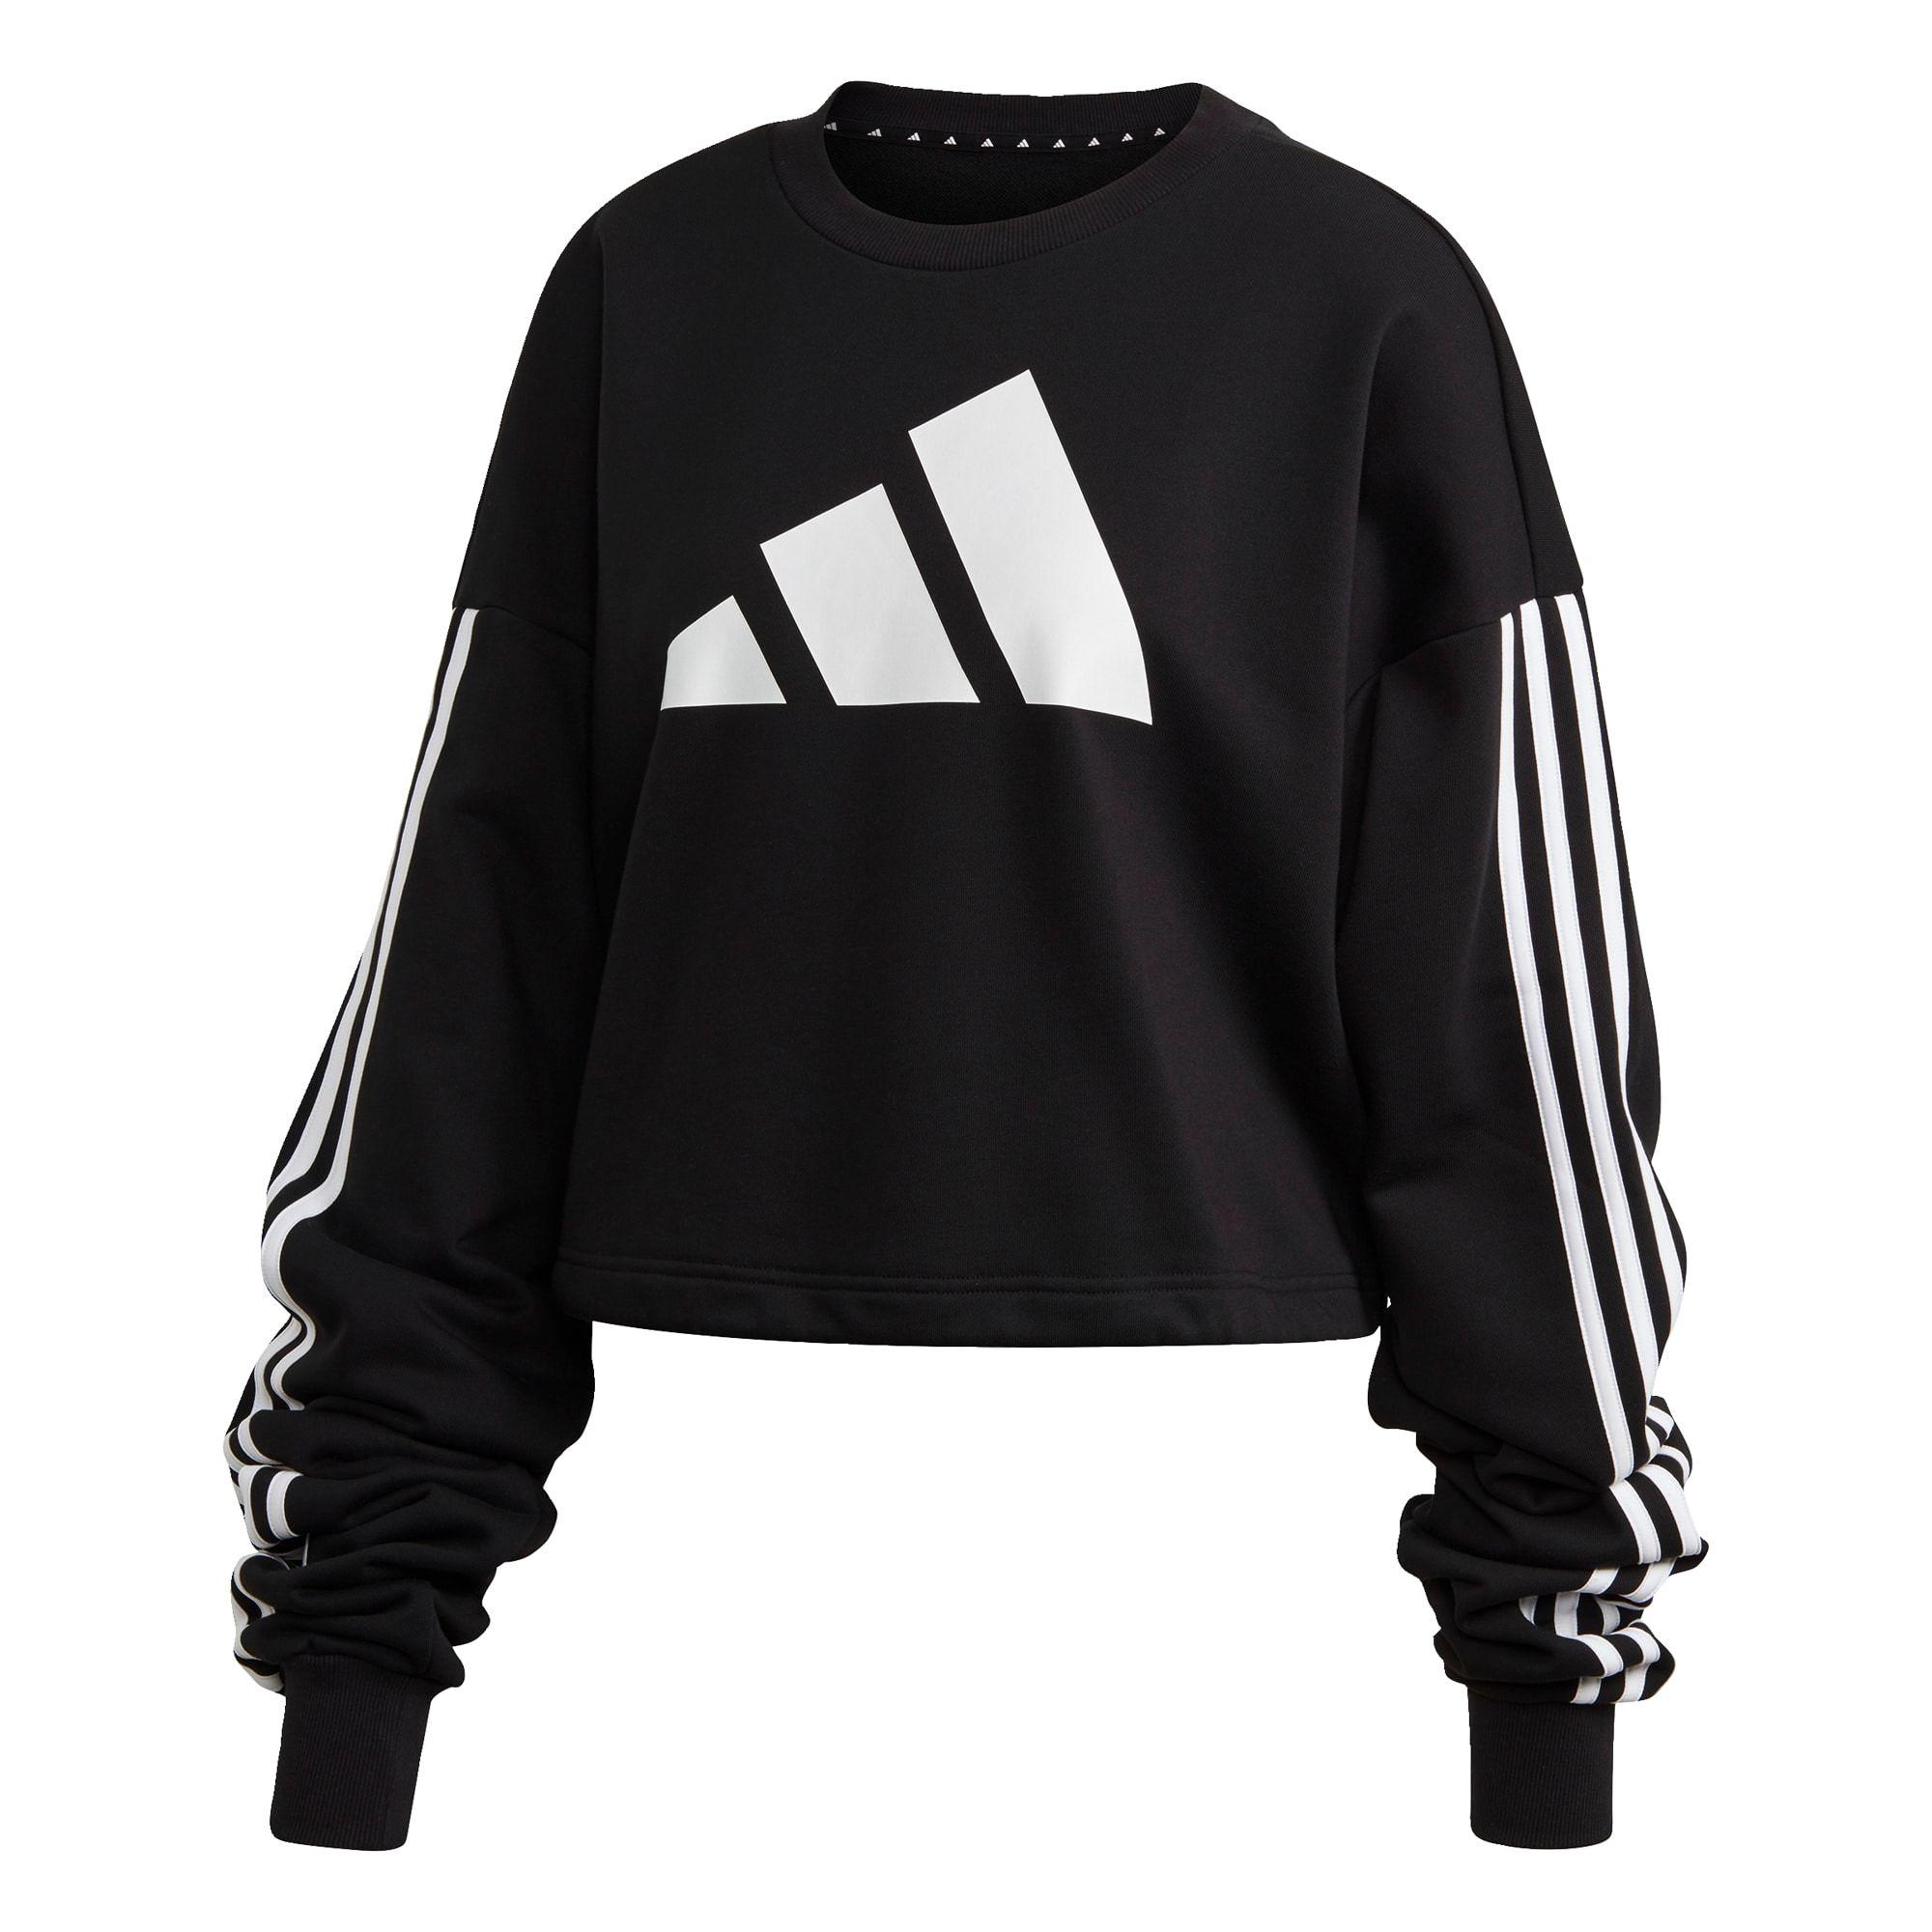 Adidas Performance Damen Schwarz Wei Szlig Gr Ouml Szlig E Xxl In 2020 Sweatshirt Schwarze Adidas Kurze Schnitte